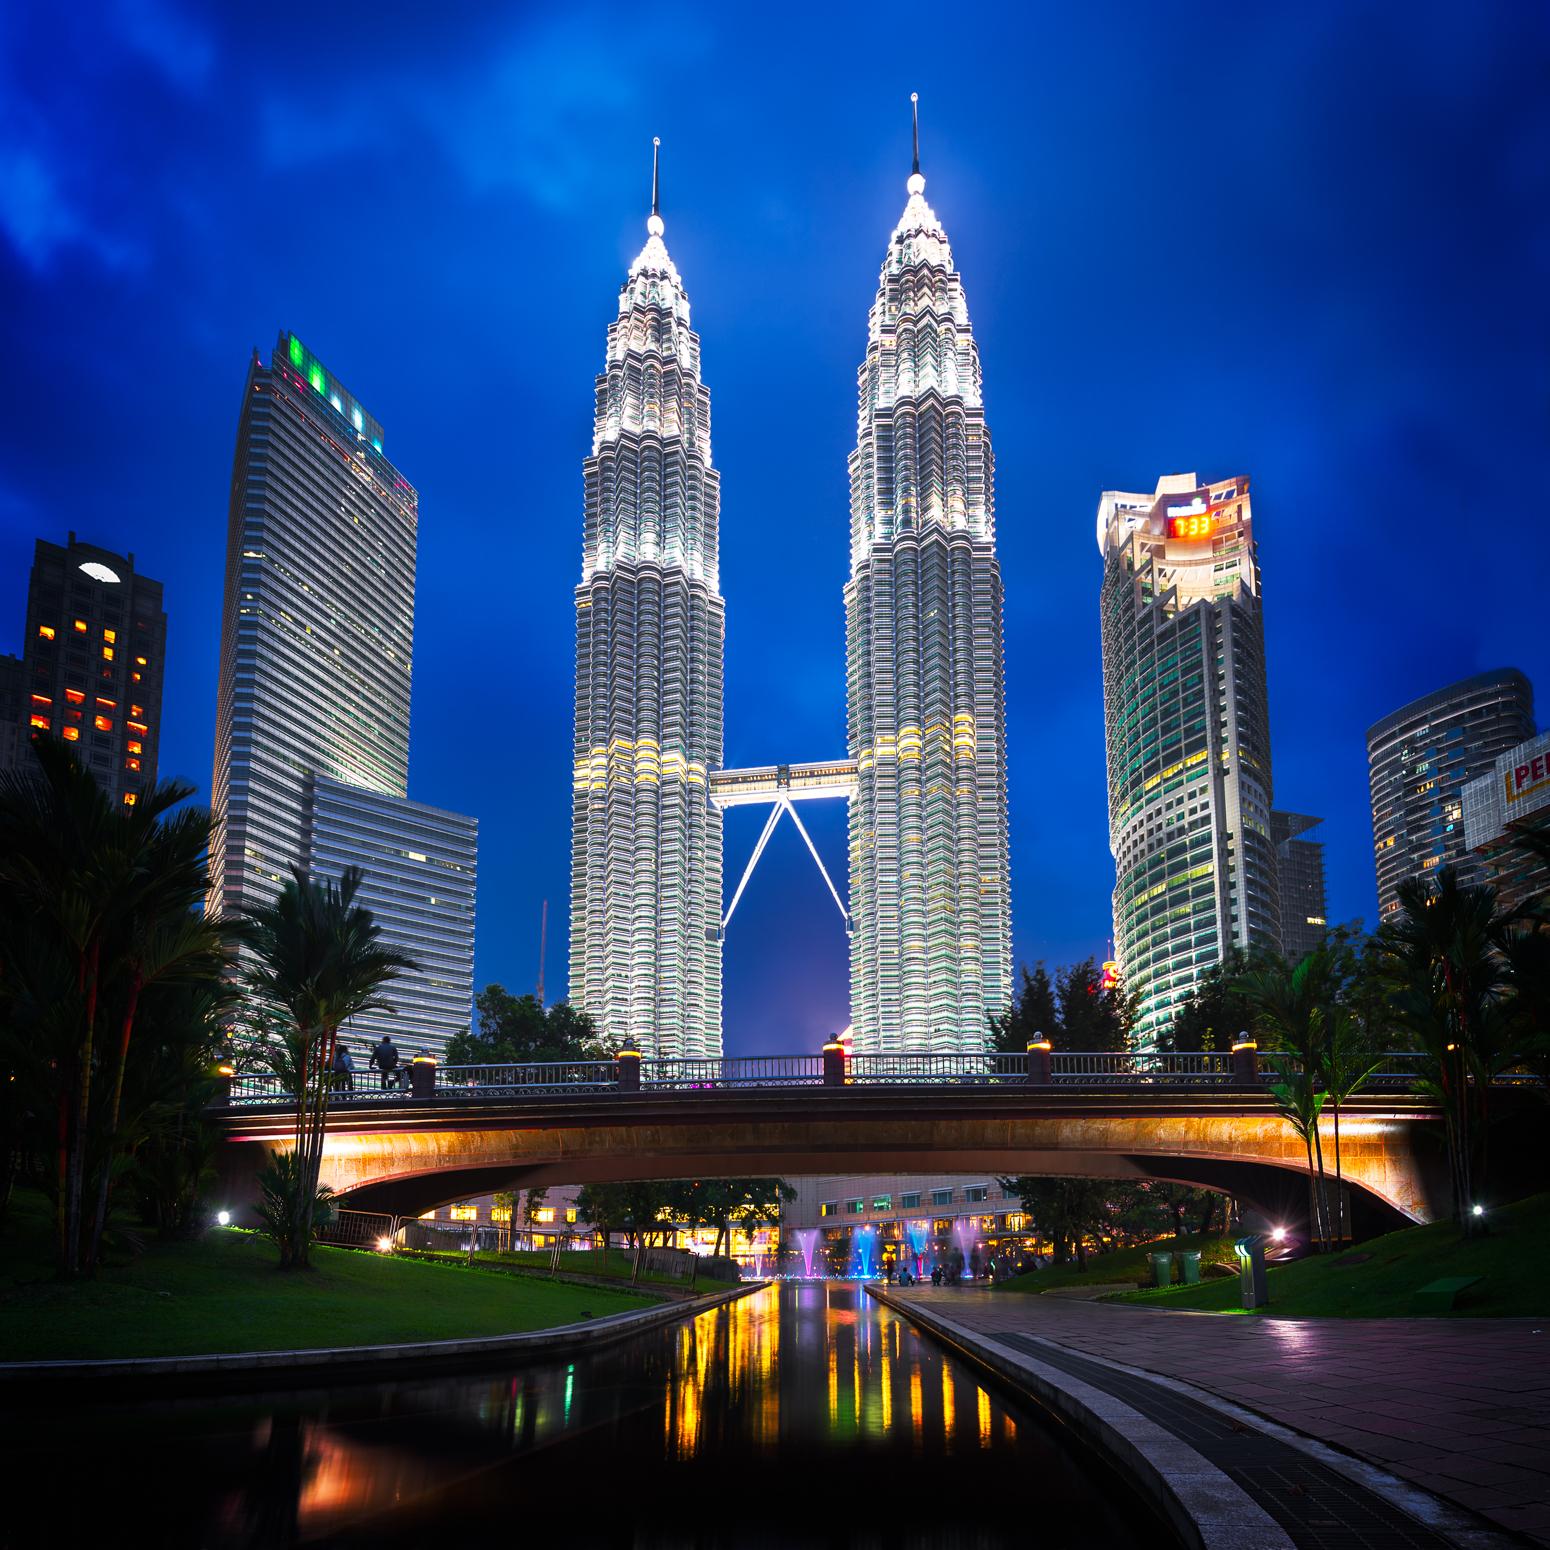 Flüge: Malaysia, Thailand & Hongkong  [September - Januar / März] - Hin- und Rückflug mit Royal Jordanian von Frankfurt und Berlin nach Kuala Lumpur ab nur 356€ inkl. Gepäck / Bangkok ab 354€ / Hongkong ab 350€